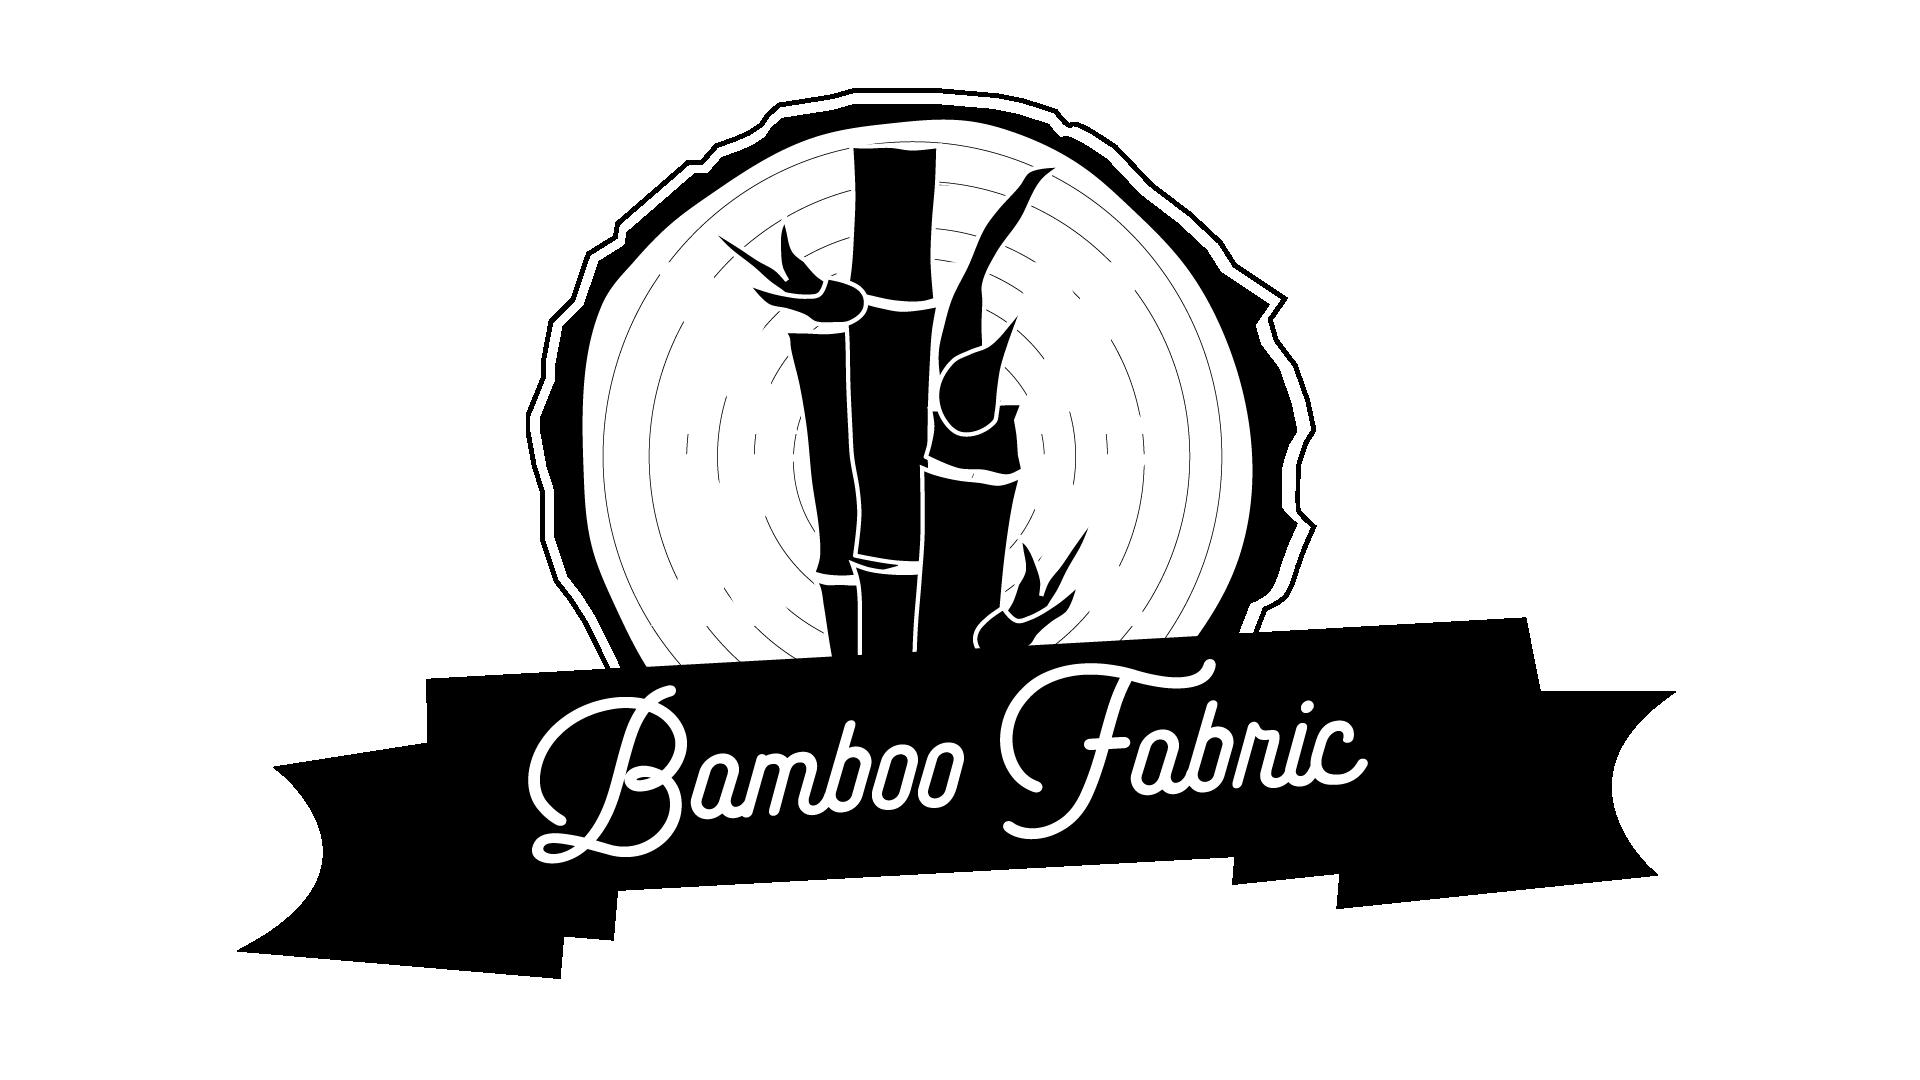 Bamboo013018b.png